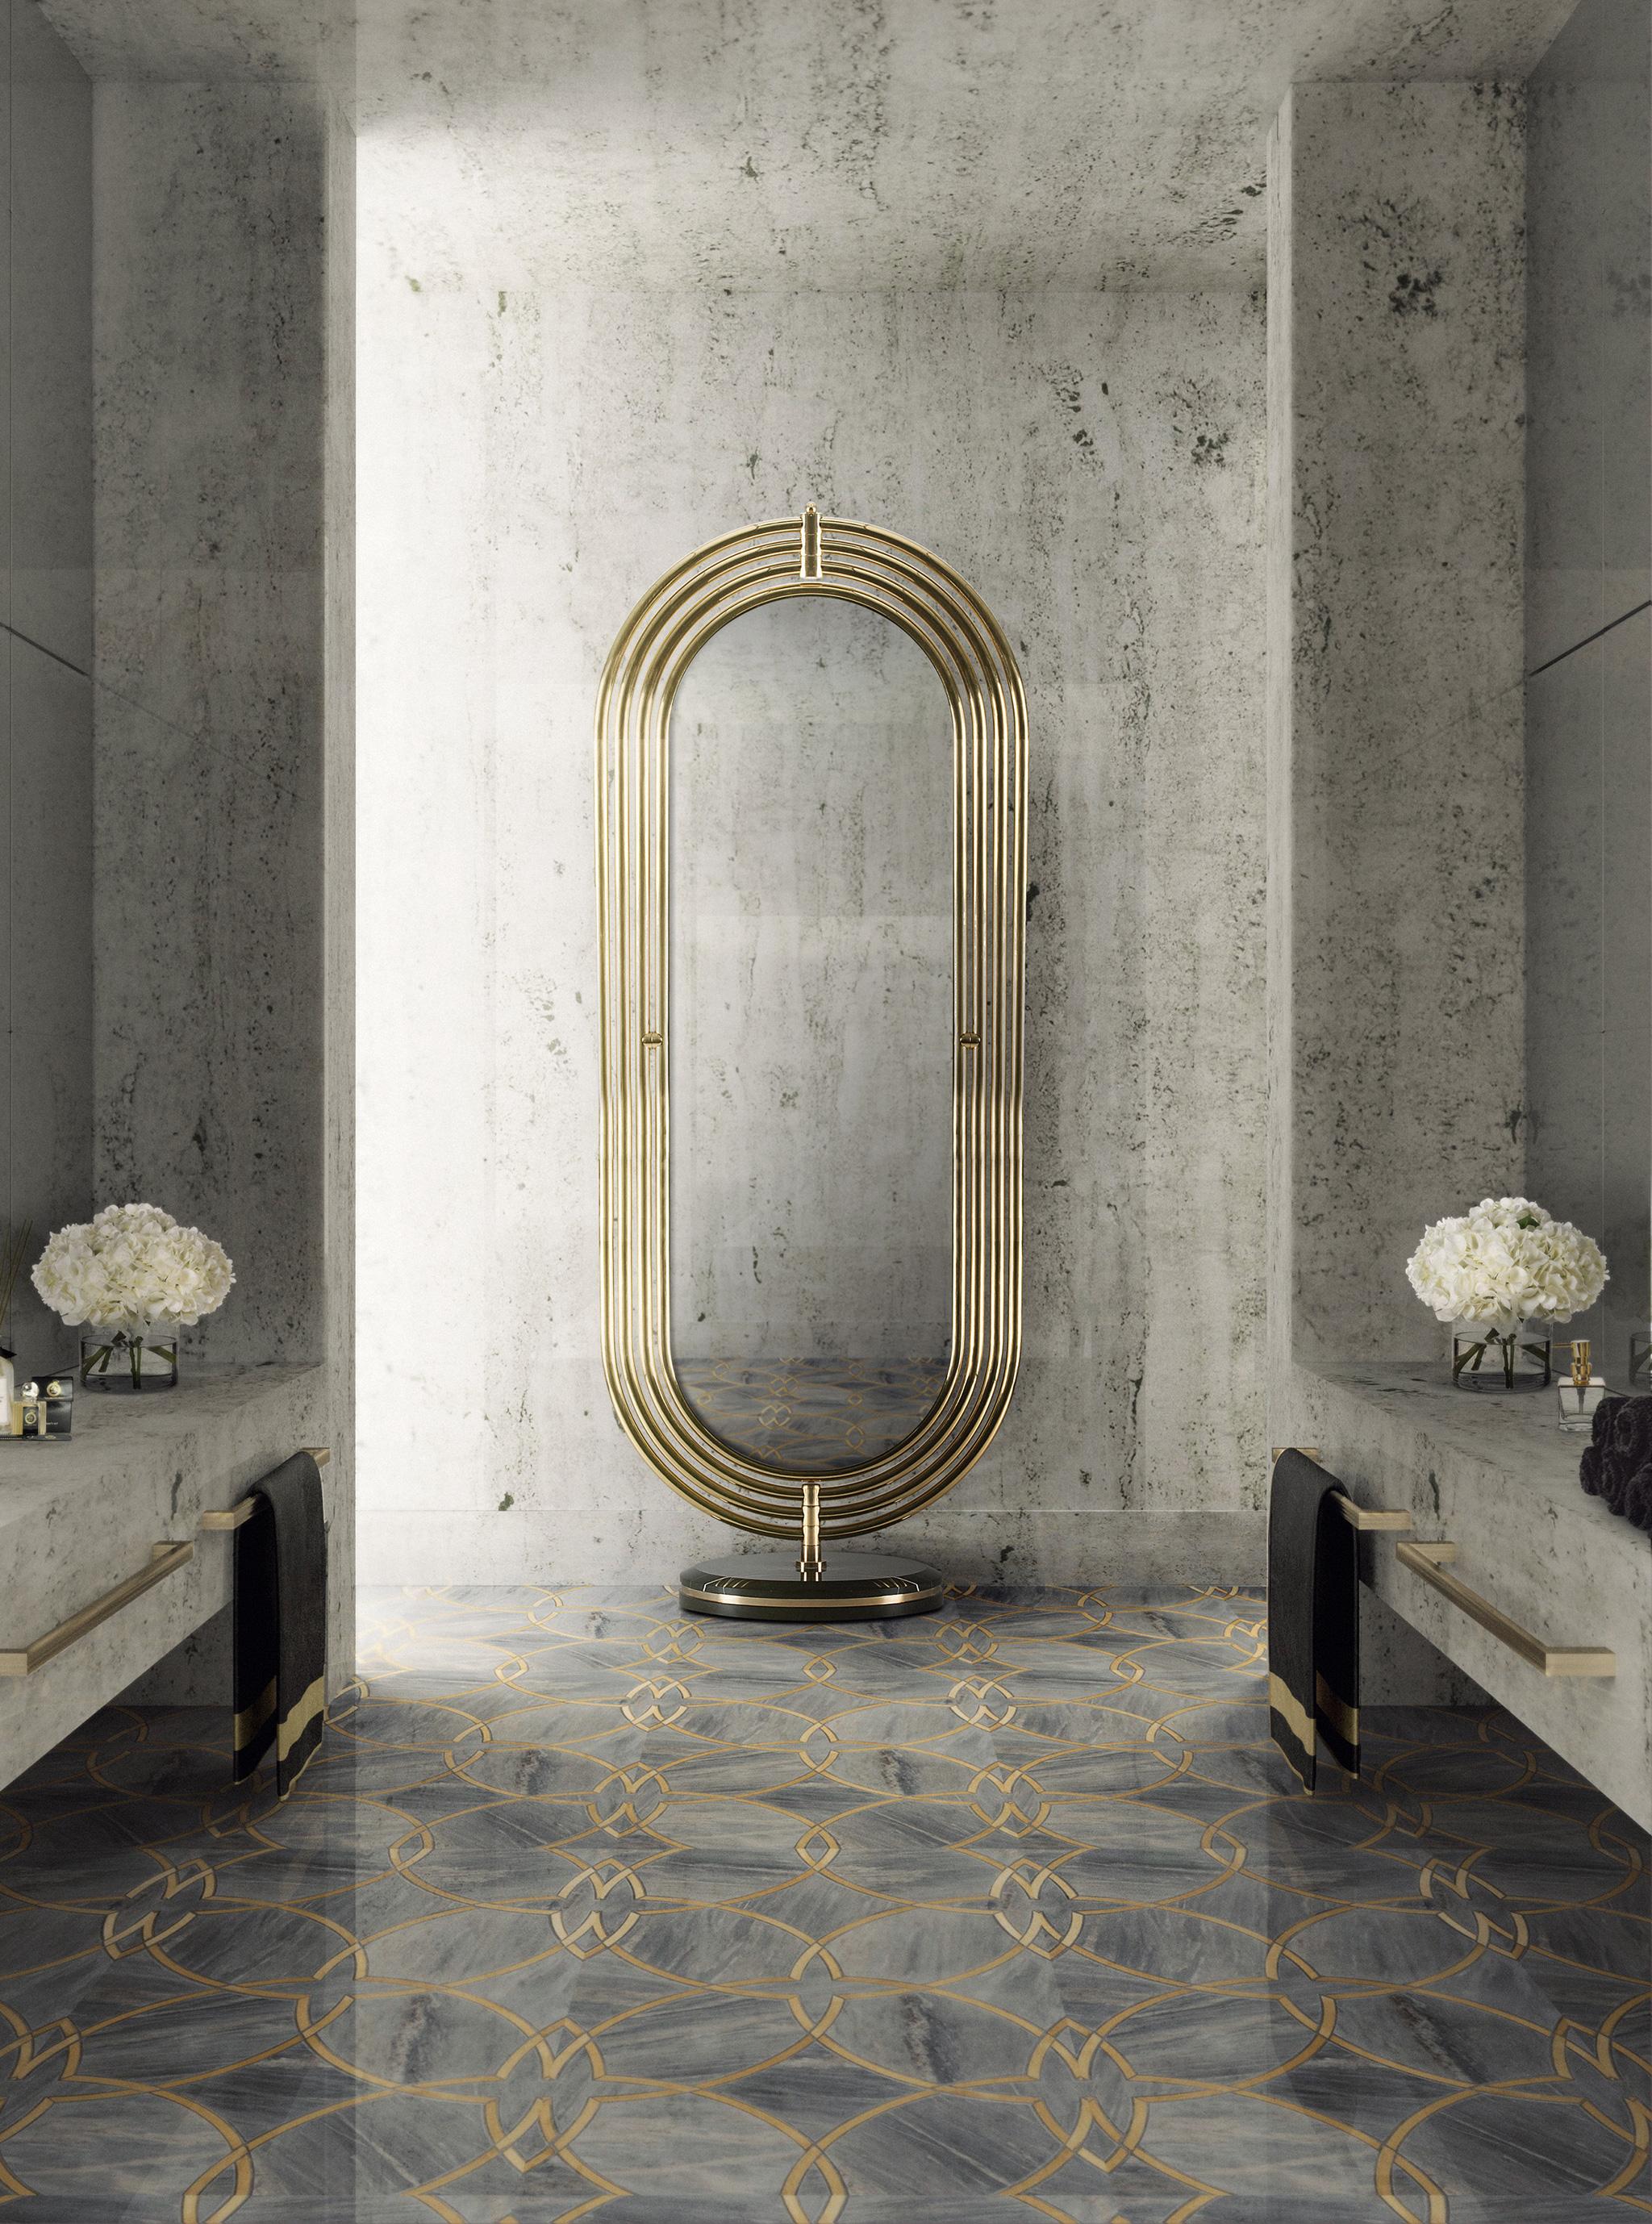 Maison Valentina S Incredible New Designs Fashion